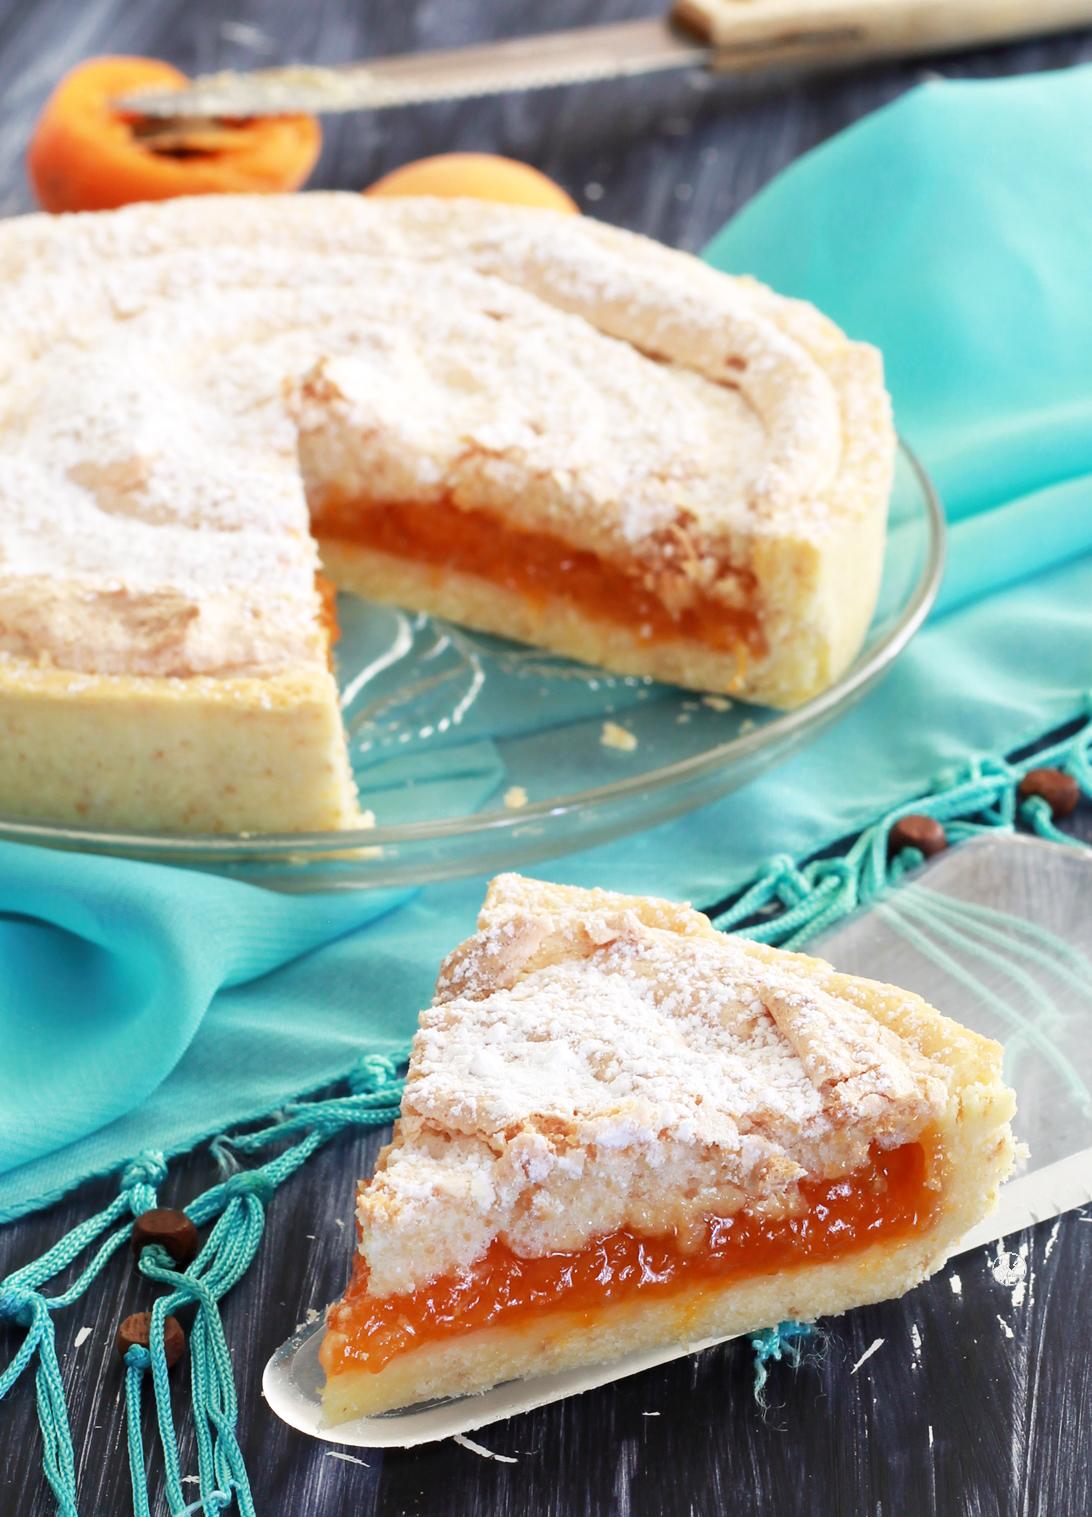 Crostata di albicocche o Fénétra toulousaine ma gluten free - La Cassata Celiaca